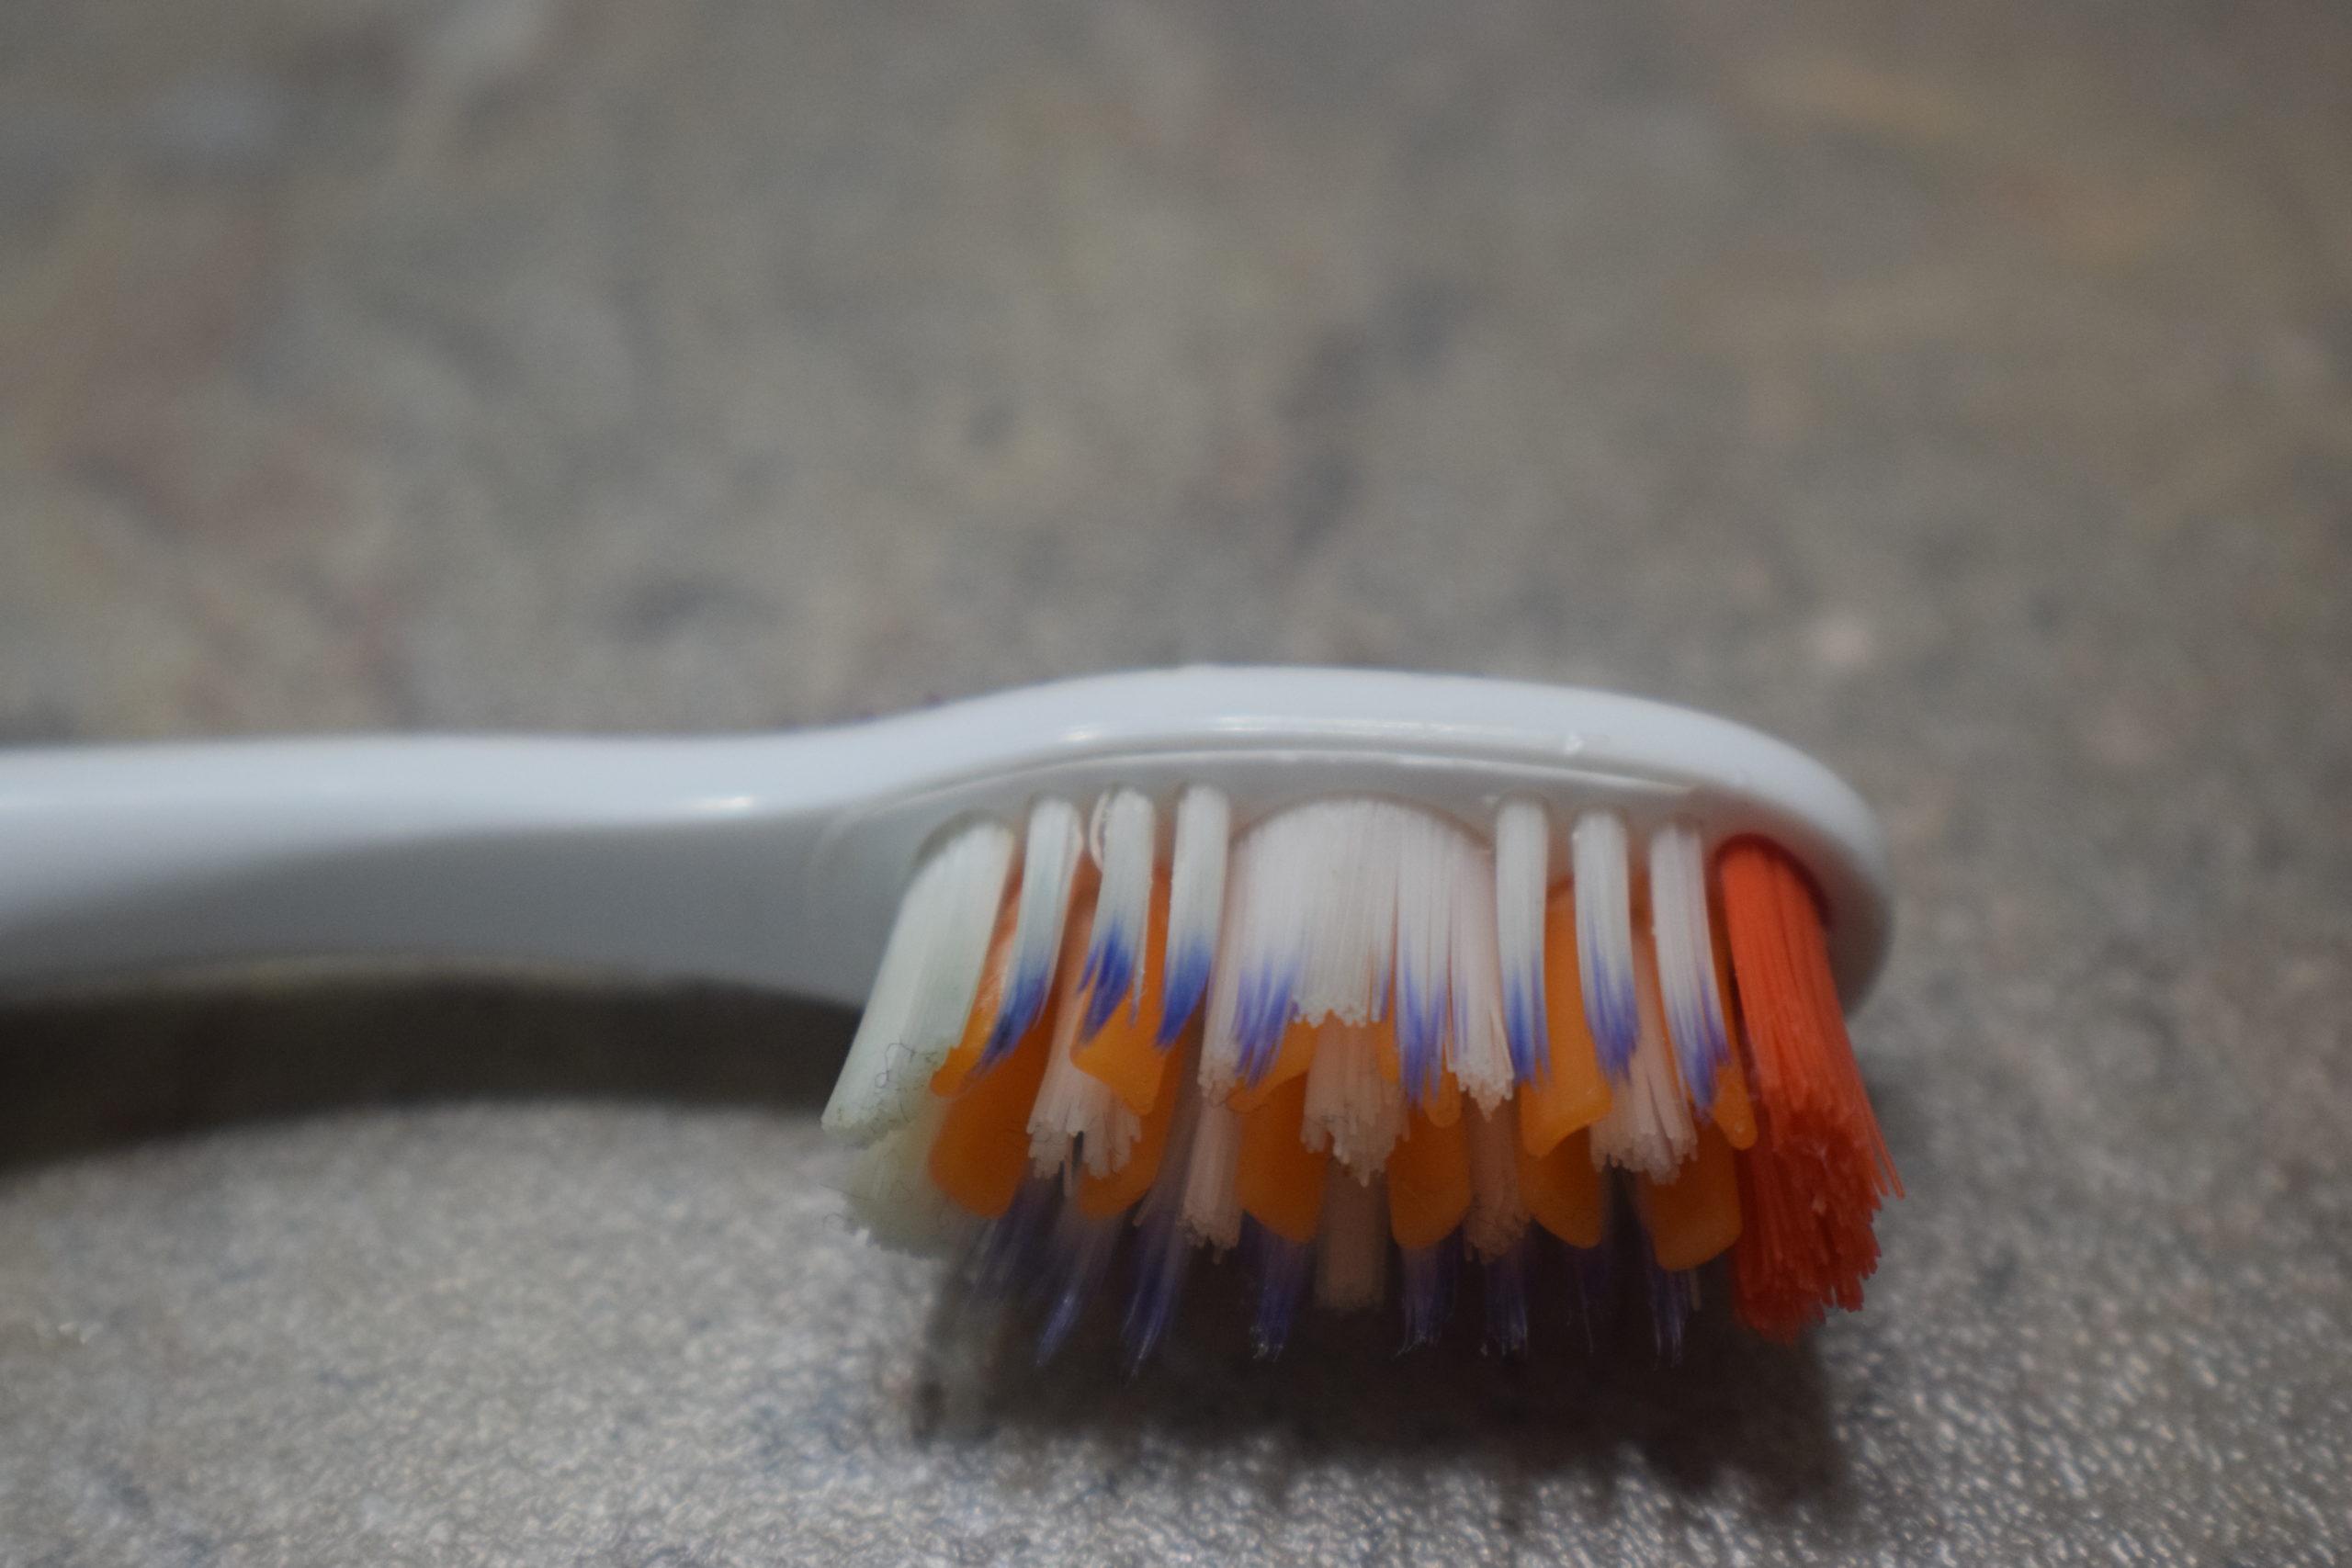 Orange, purple and white bristles on a toothbrush